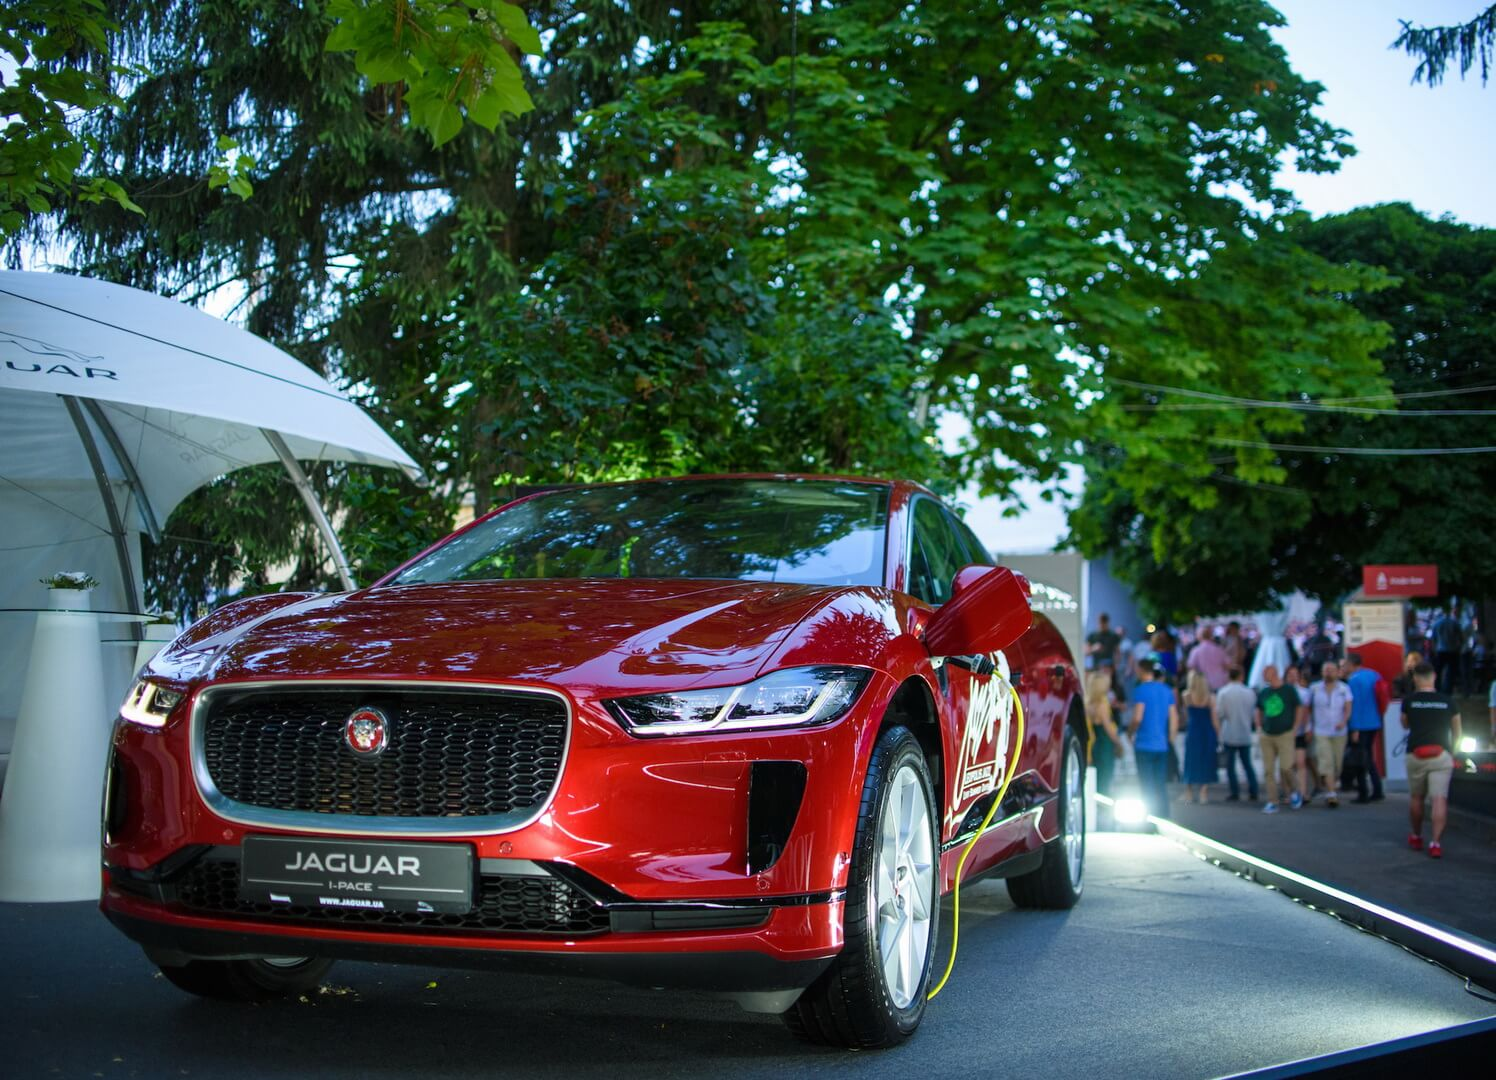 Jaguar представил электромобиль I-Pace наLeopolis Jazz Fest 2019 воЛьвове